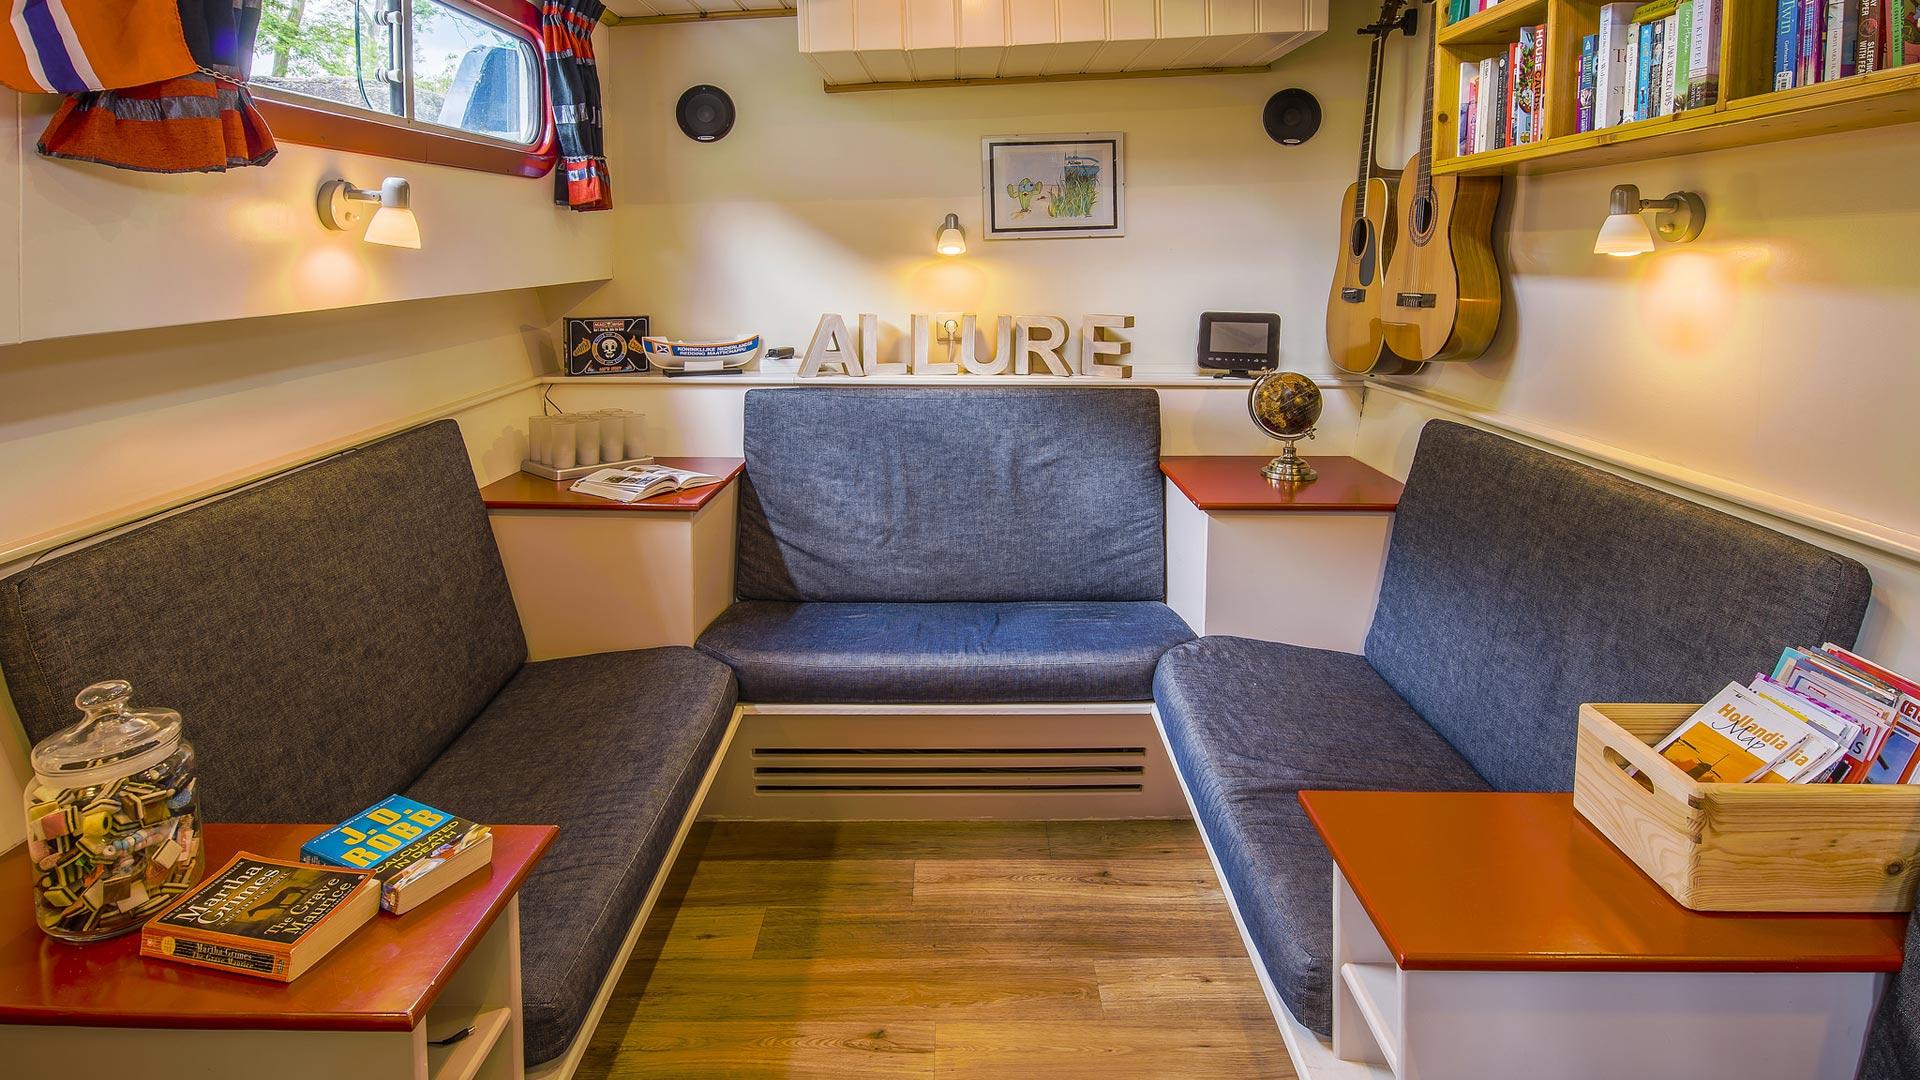 De bibliotheek op hotelschip MS Allure. © SE-Tours